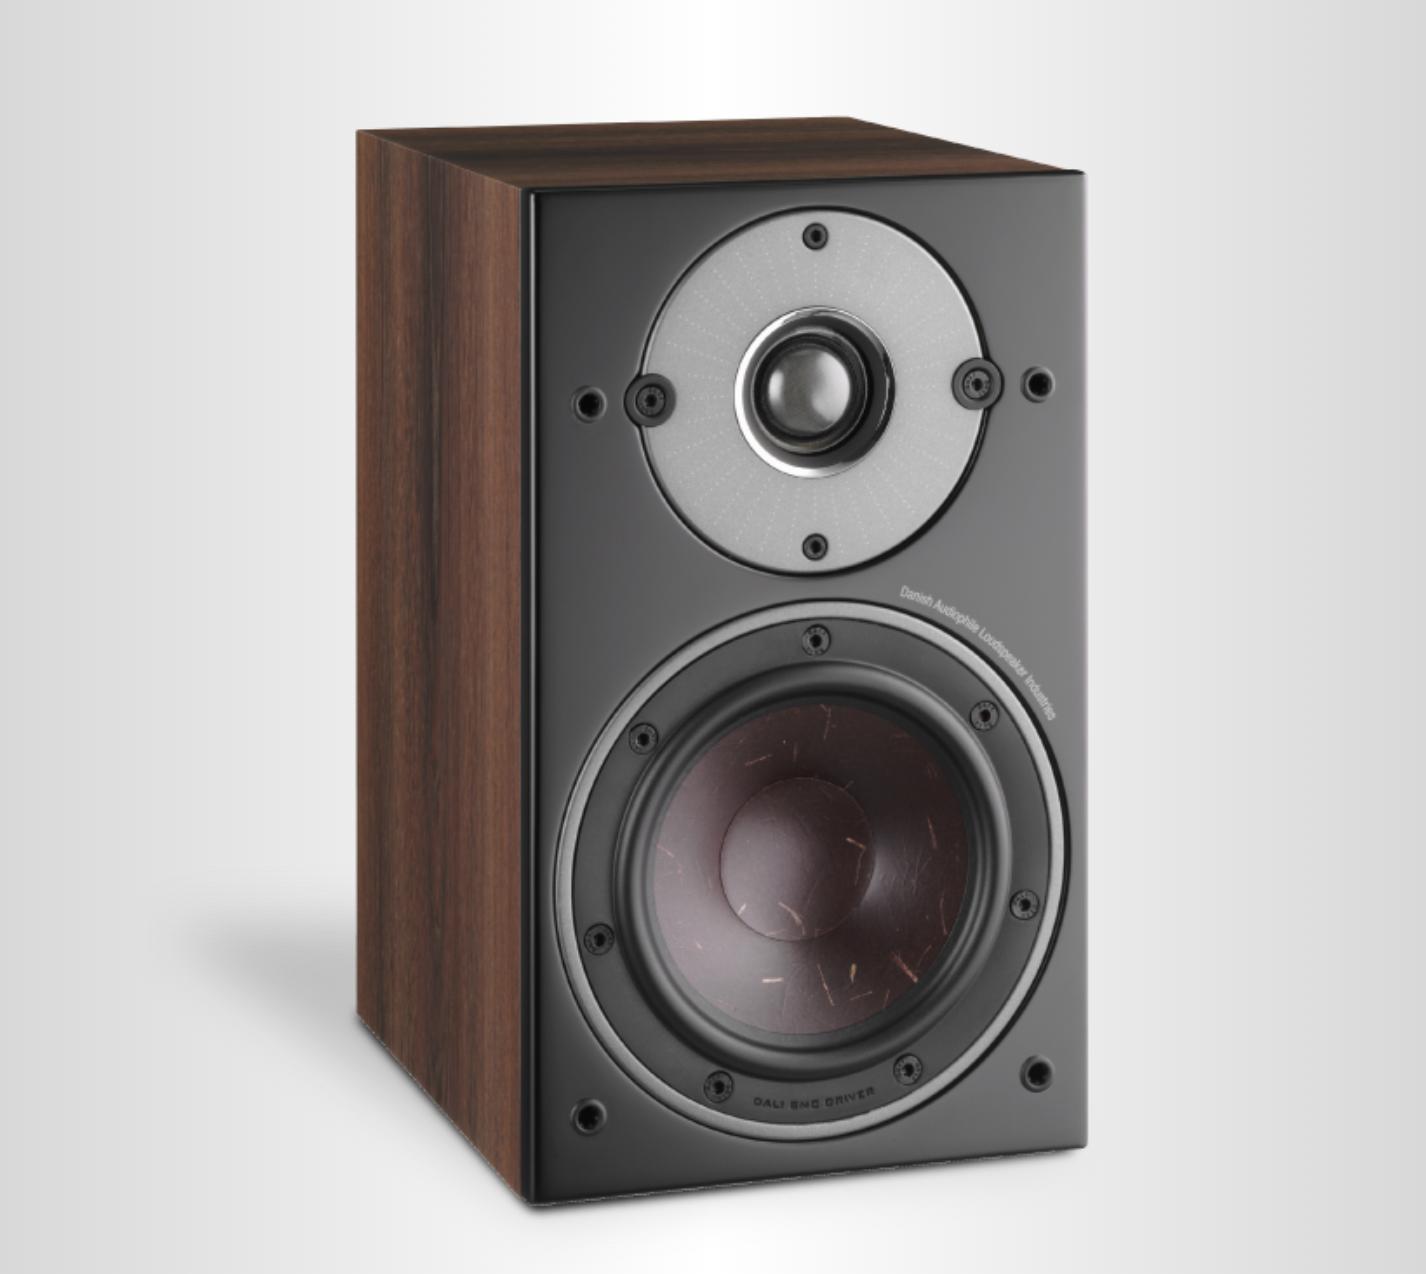 DALI Oberon 1 Compact Bookshelf Speaker